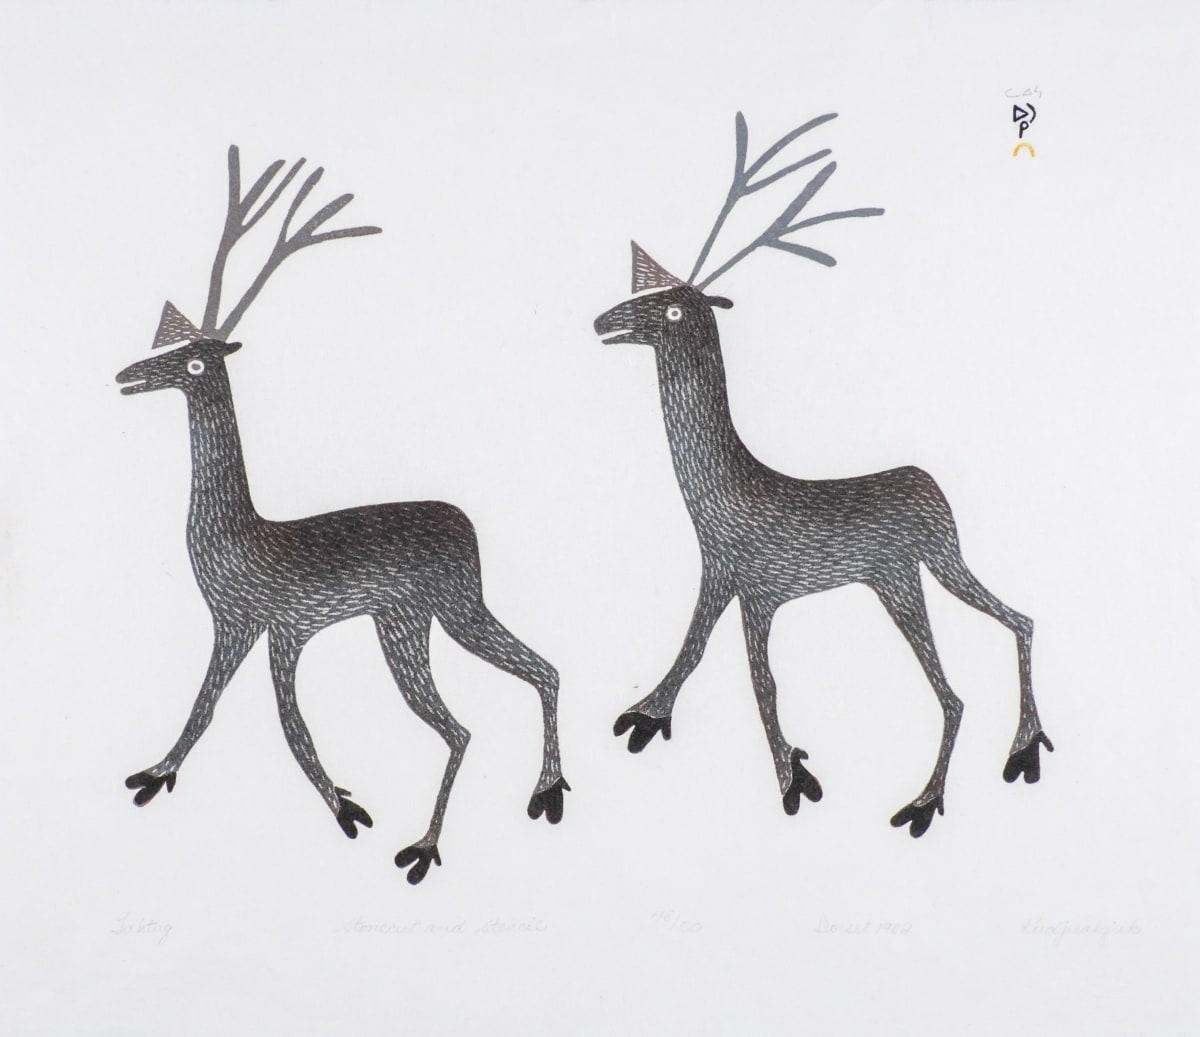 LOT 39 MARY KUDJUAKJU (1908-1982) KINNGAIT (CAPE DORSET) Tuktuq, 1982 stonecut and stencil, 19 x 22 in (48.3 x 55.9 cm) ESTIMATE: $400 — $600